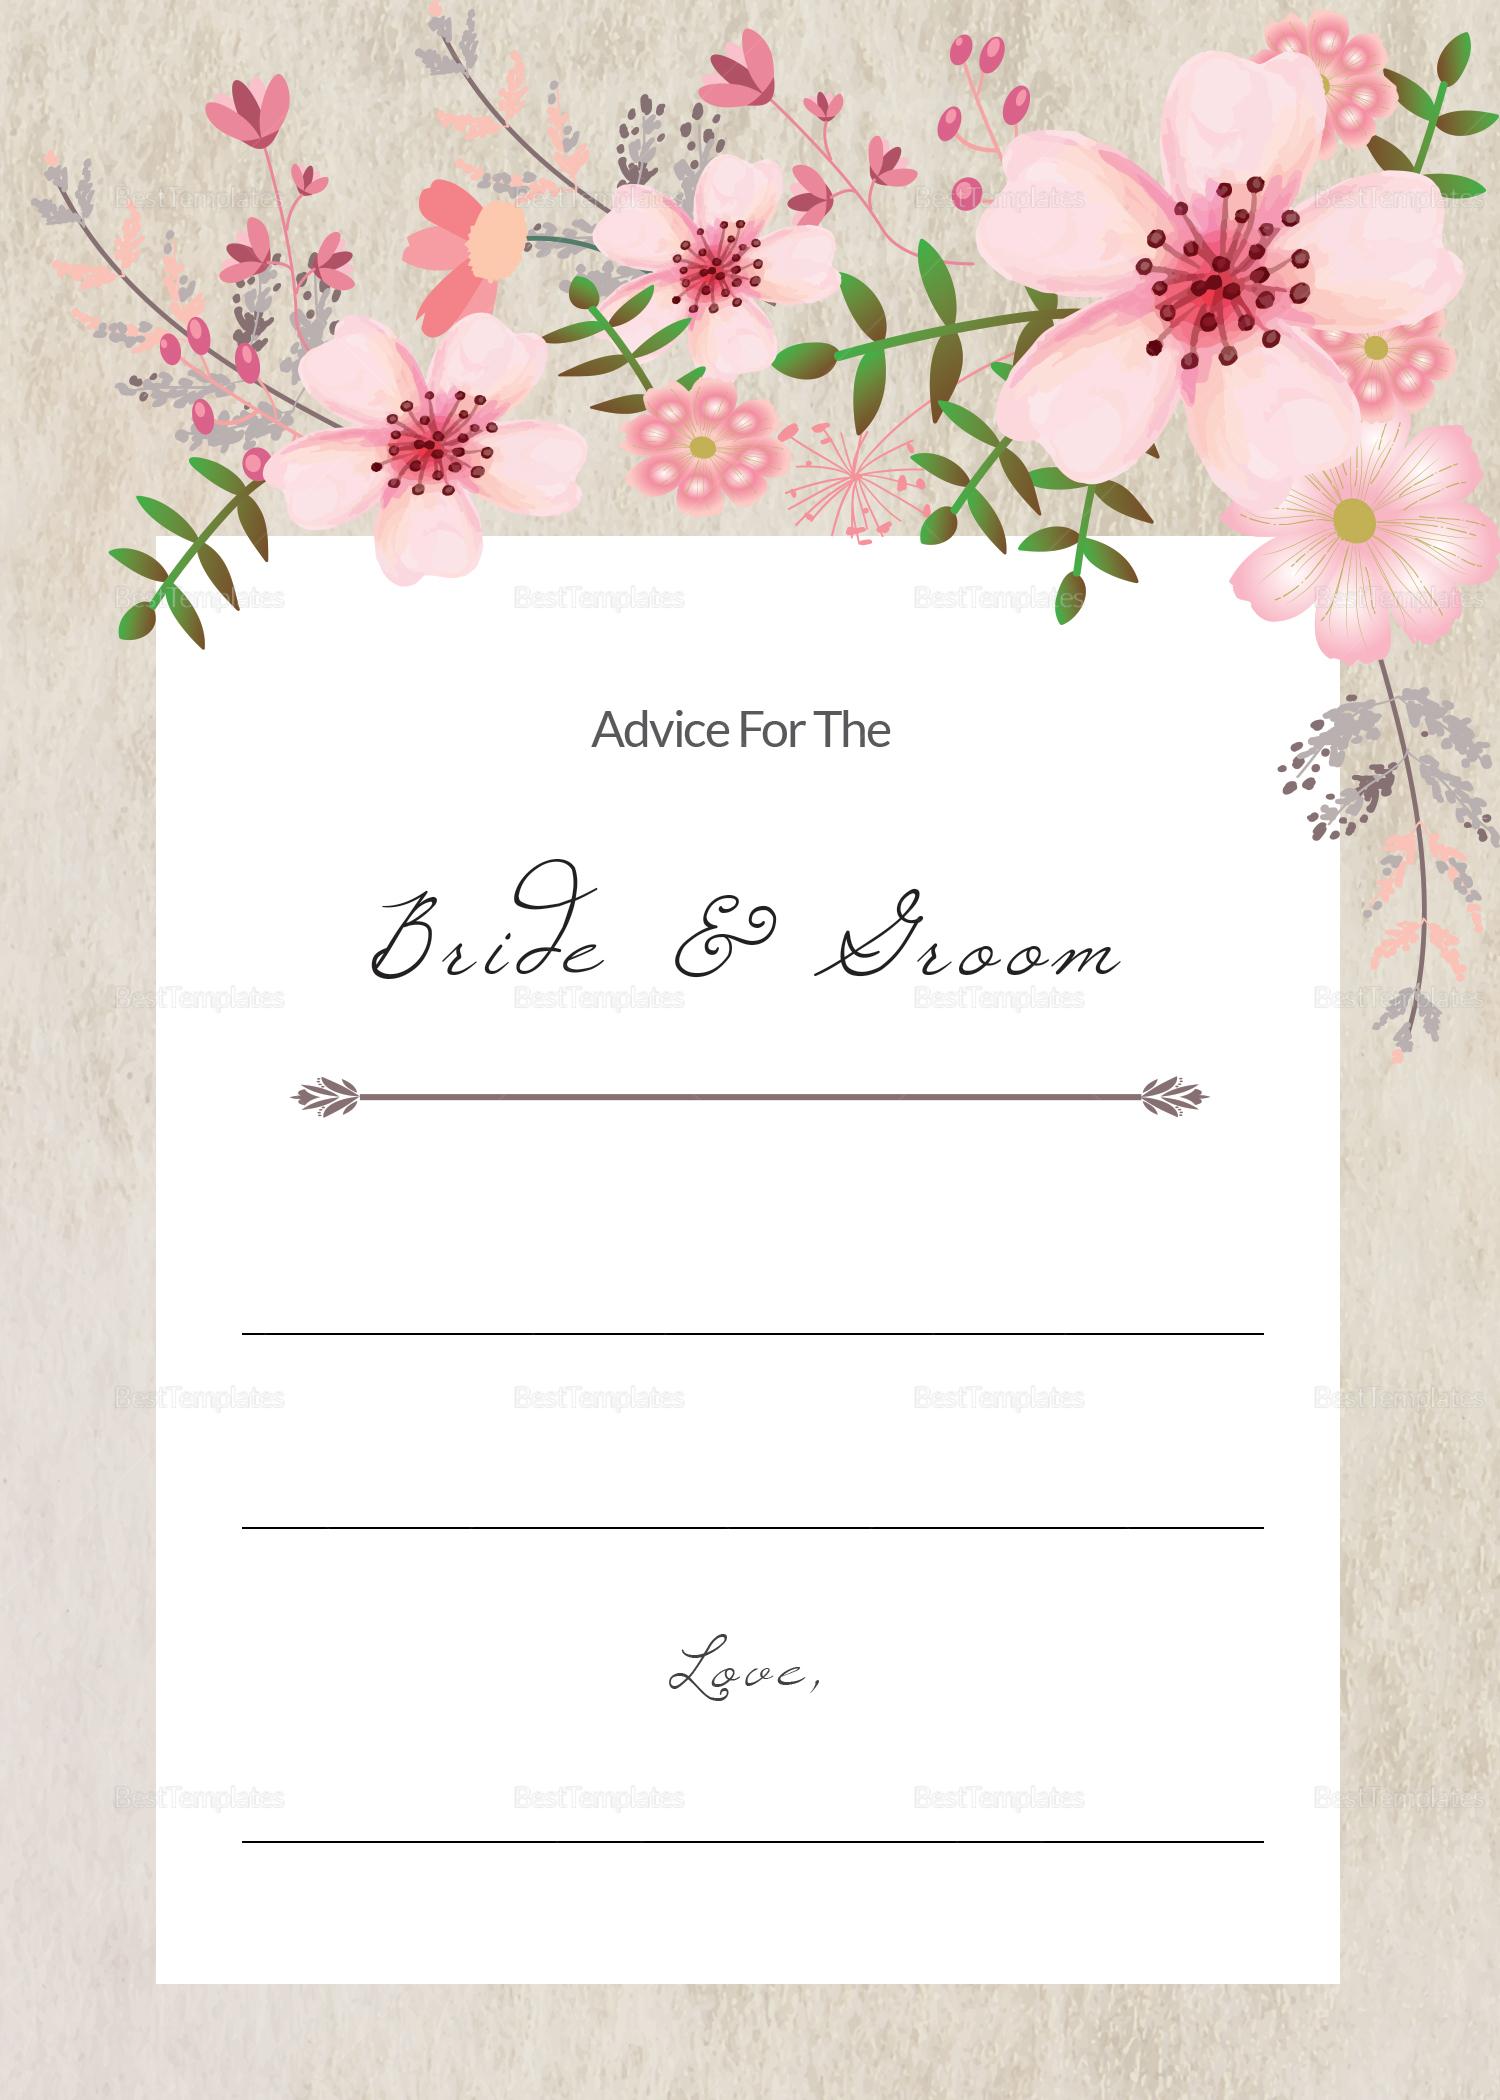 Pink Floral Wedding Advice Card Design Template